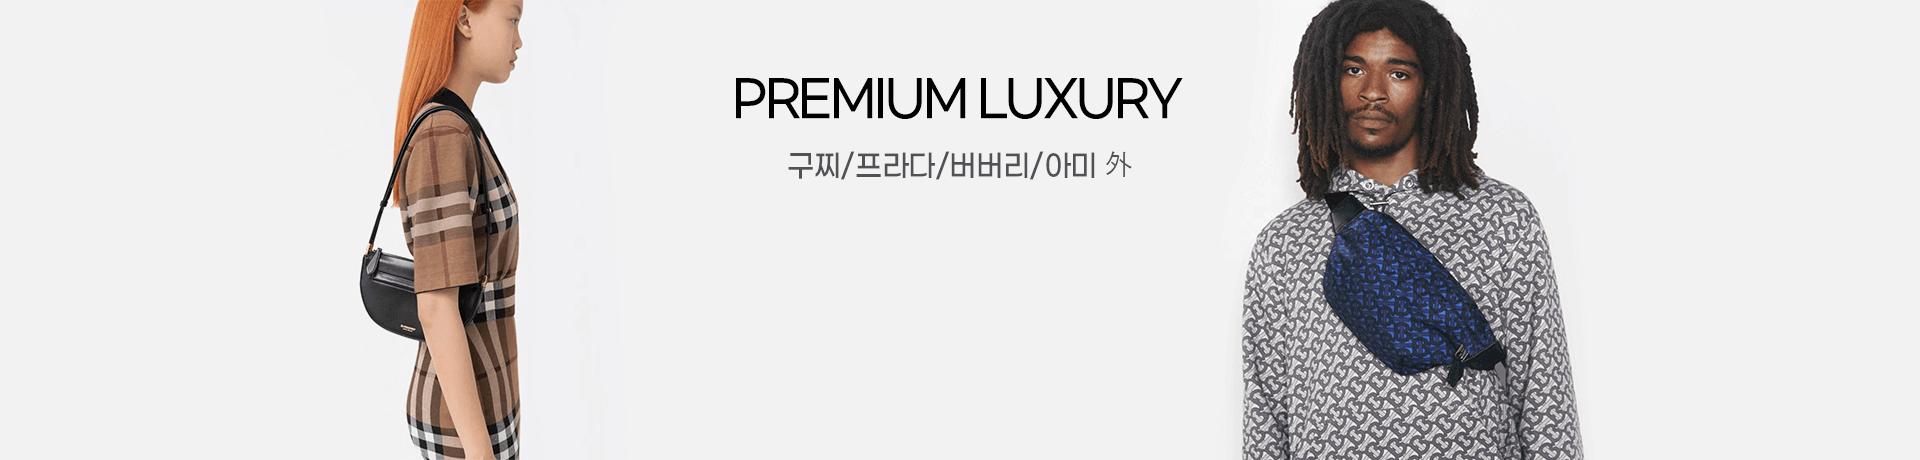 210726_sy_premiumluxury_pc_f2f2f2